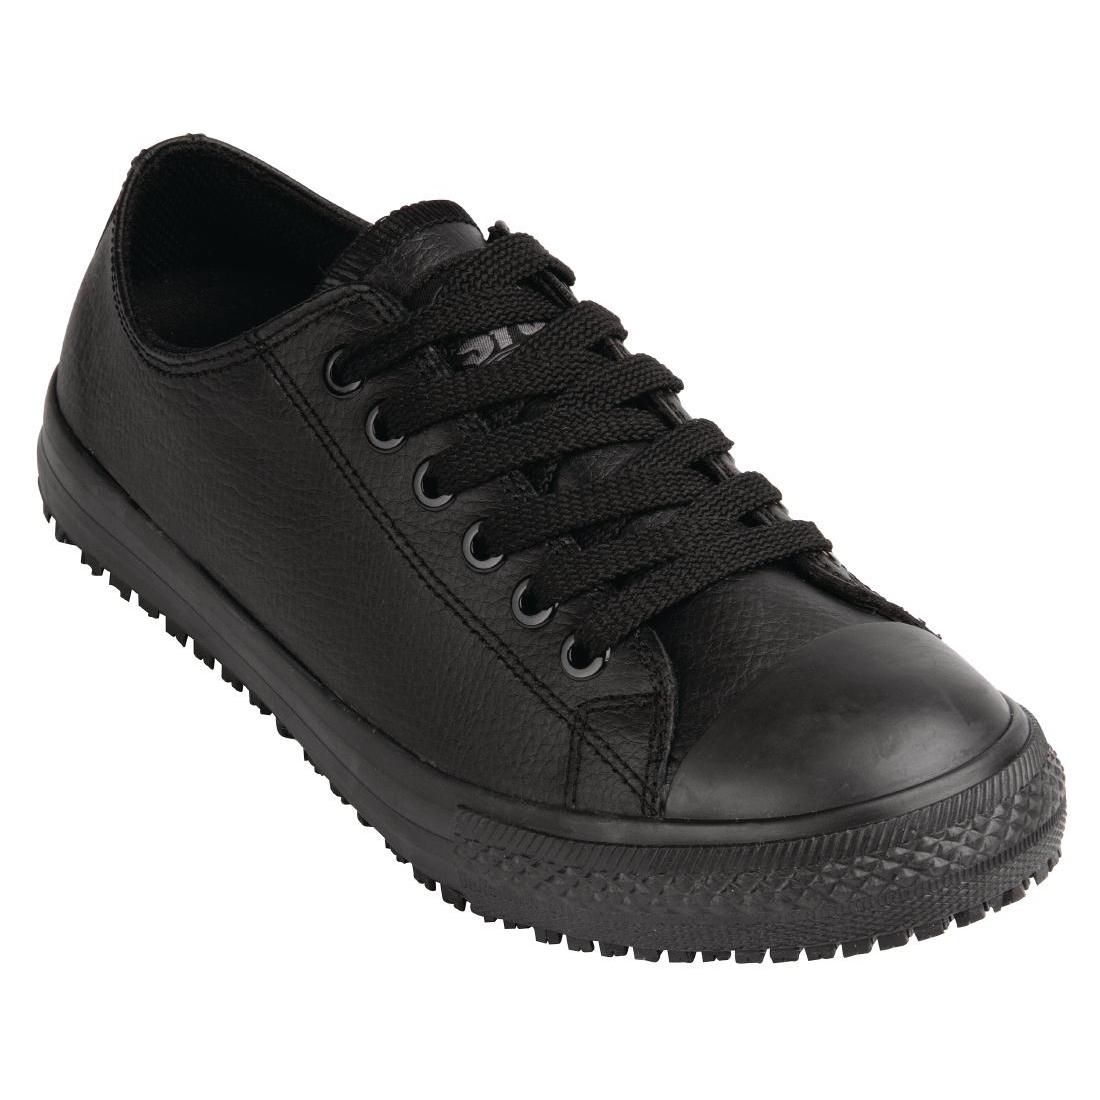 Old te Dames koop84046ce80ec9747bcc8f141d18cc3266Tot Off67Kortingen84046ce80ec9747bcc8f141d18cc3266 Adidas schoenen School eEHb2IDWY9